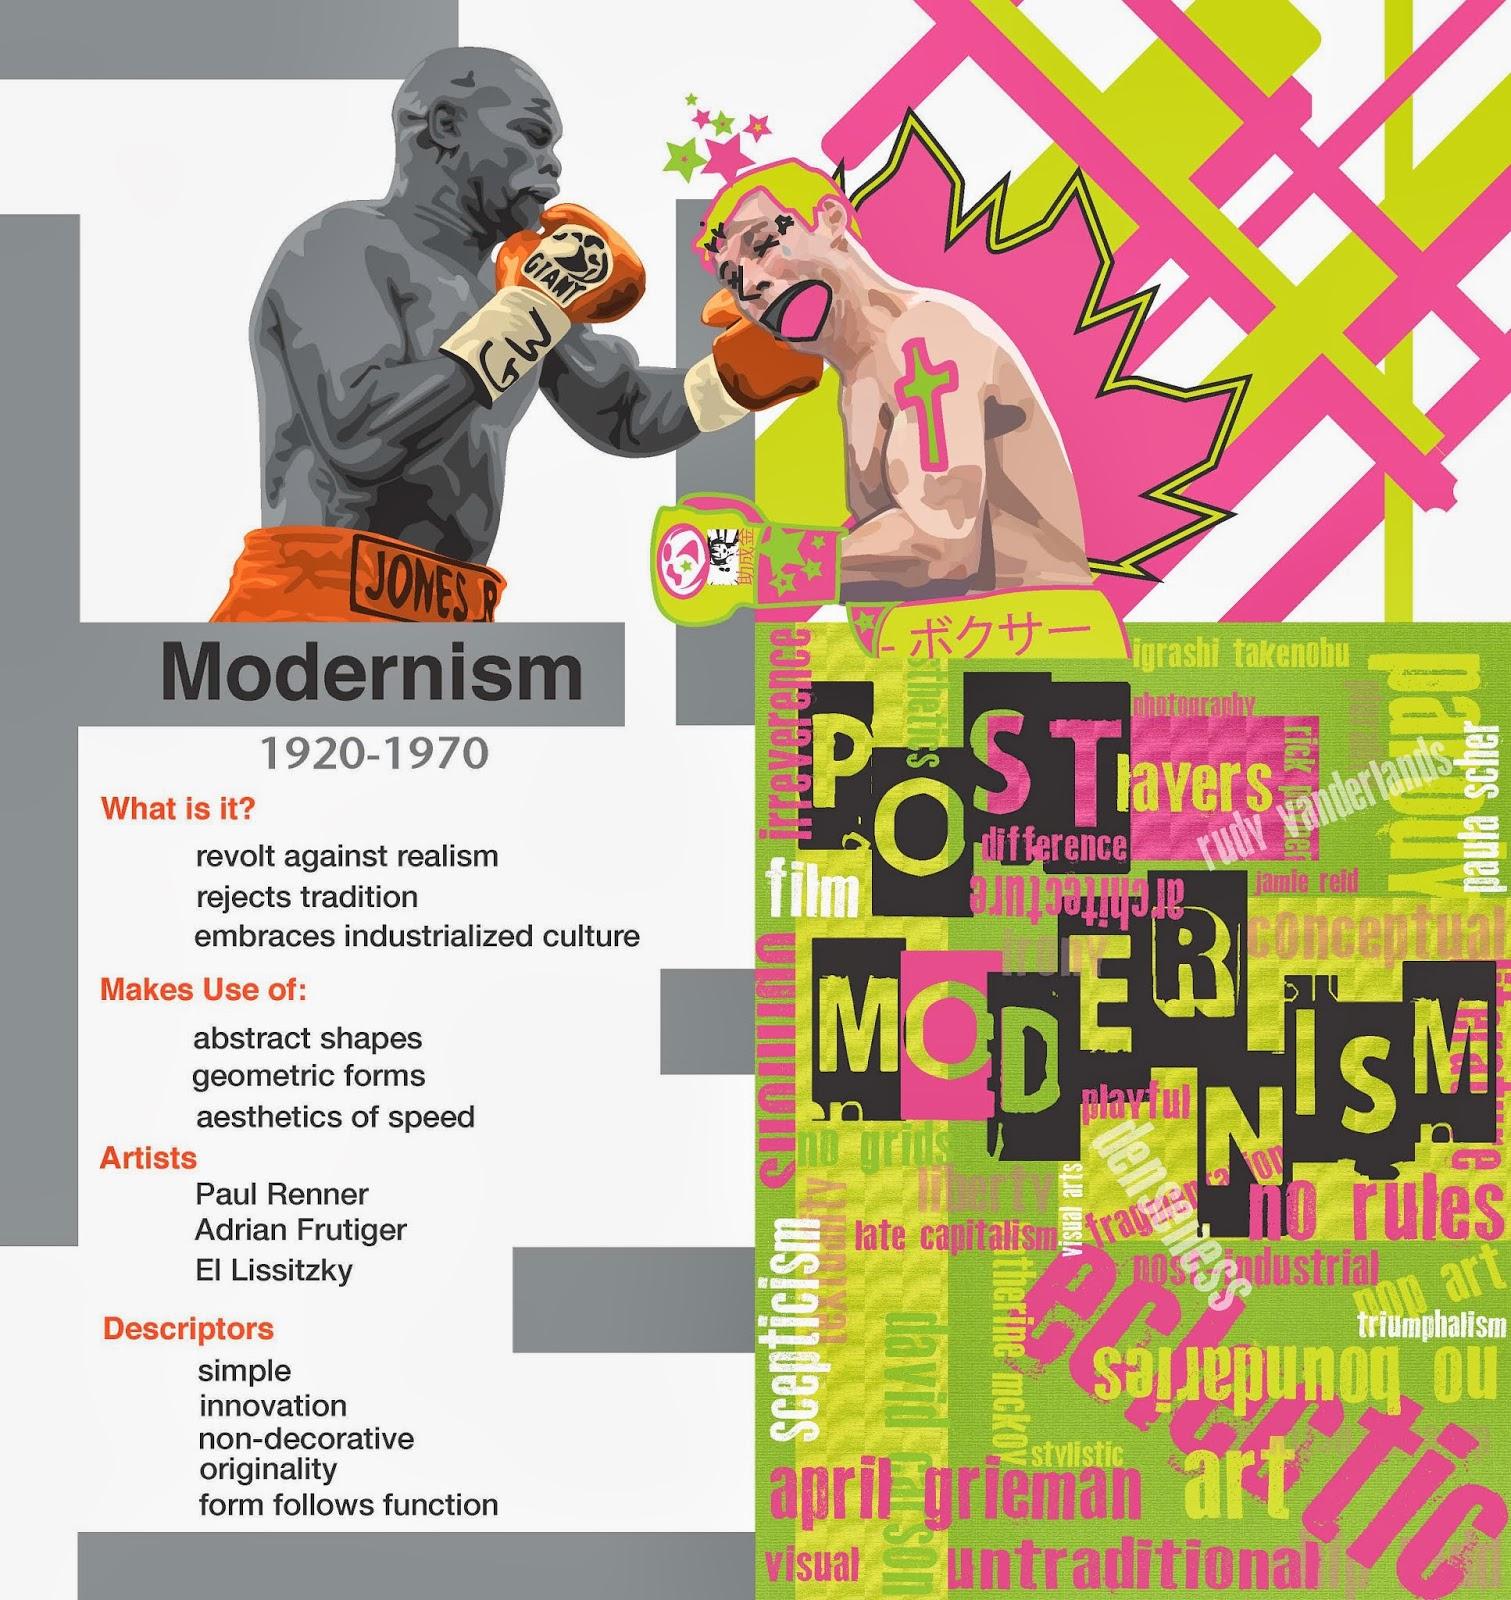 Art Modernism Vs Postmodernism